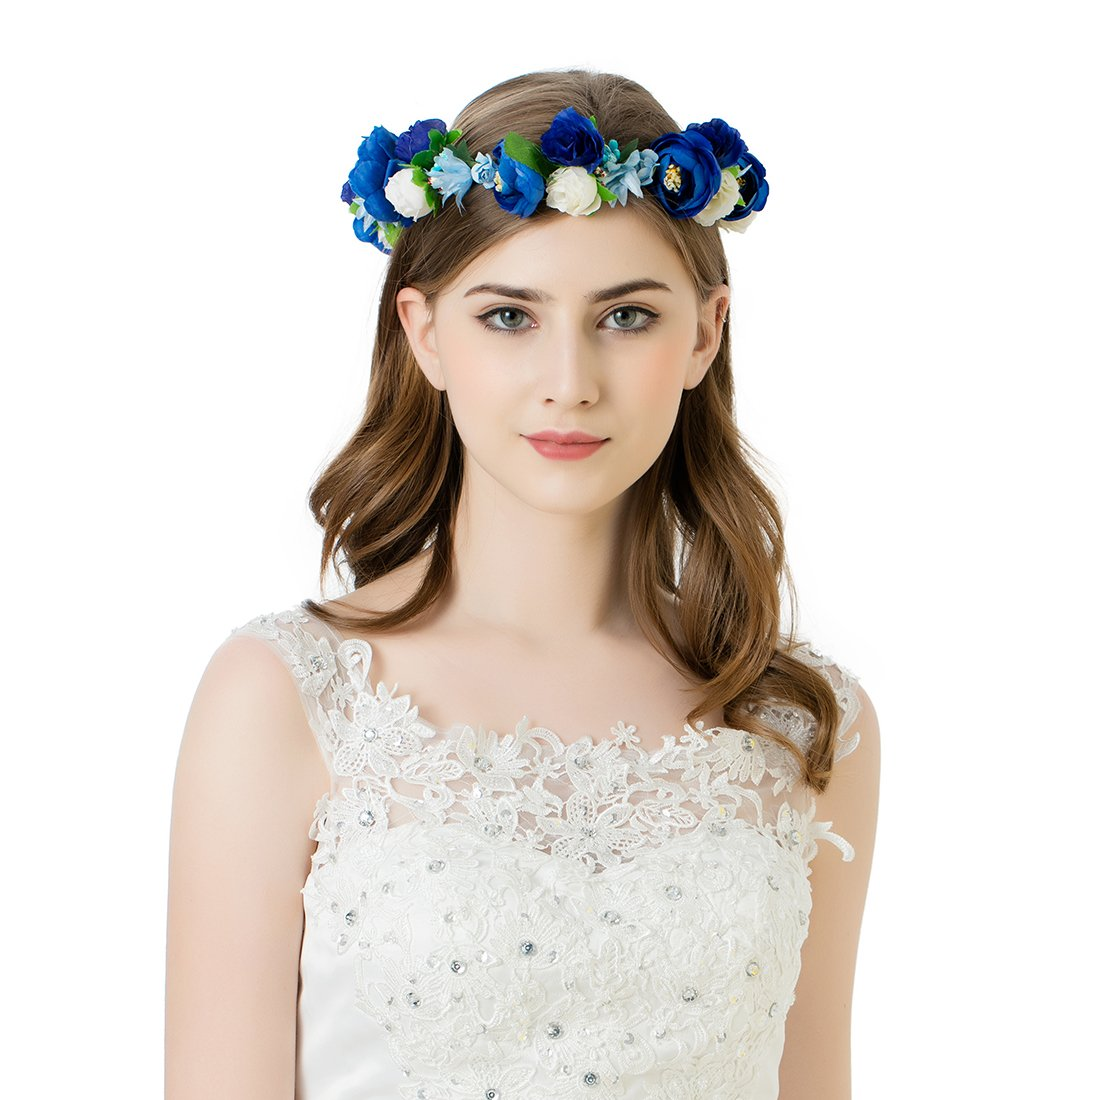 AWAYTR Flower Crown Headband for Women - Mori Girl Bride Headdress Seaside Holiday Garlands(Dark blue&Royal blue&White)